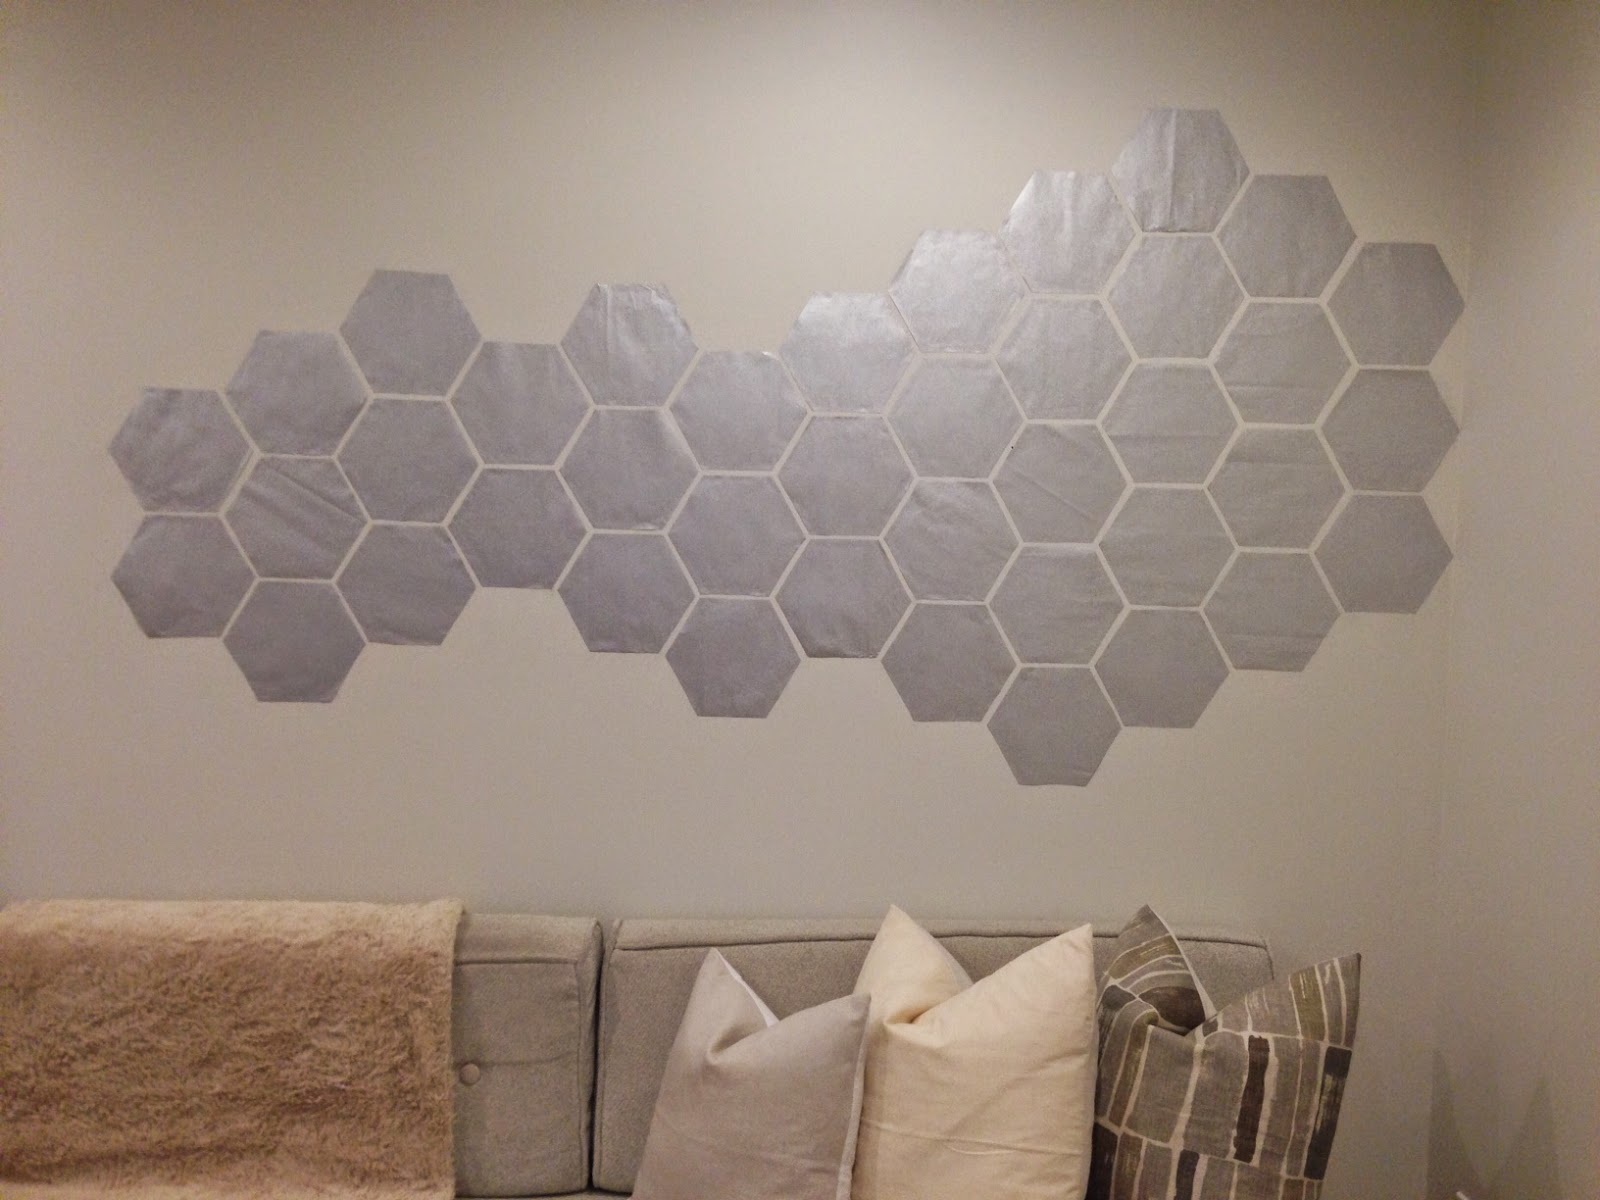 Wall Decor Hexagon : Diy hexagon honeycomb wall art live tr?s chic